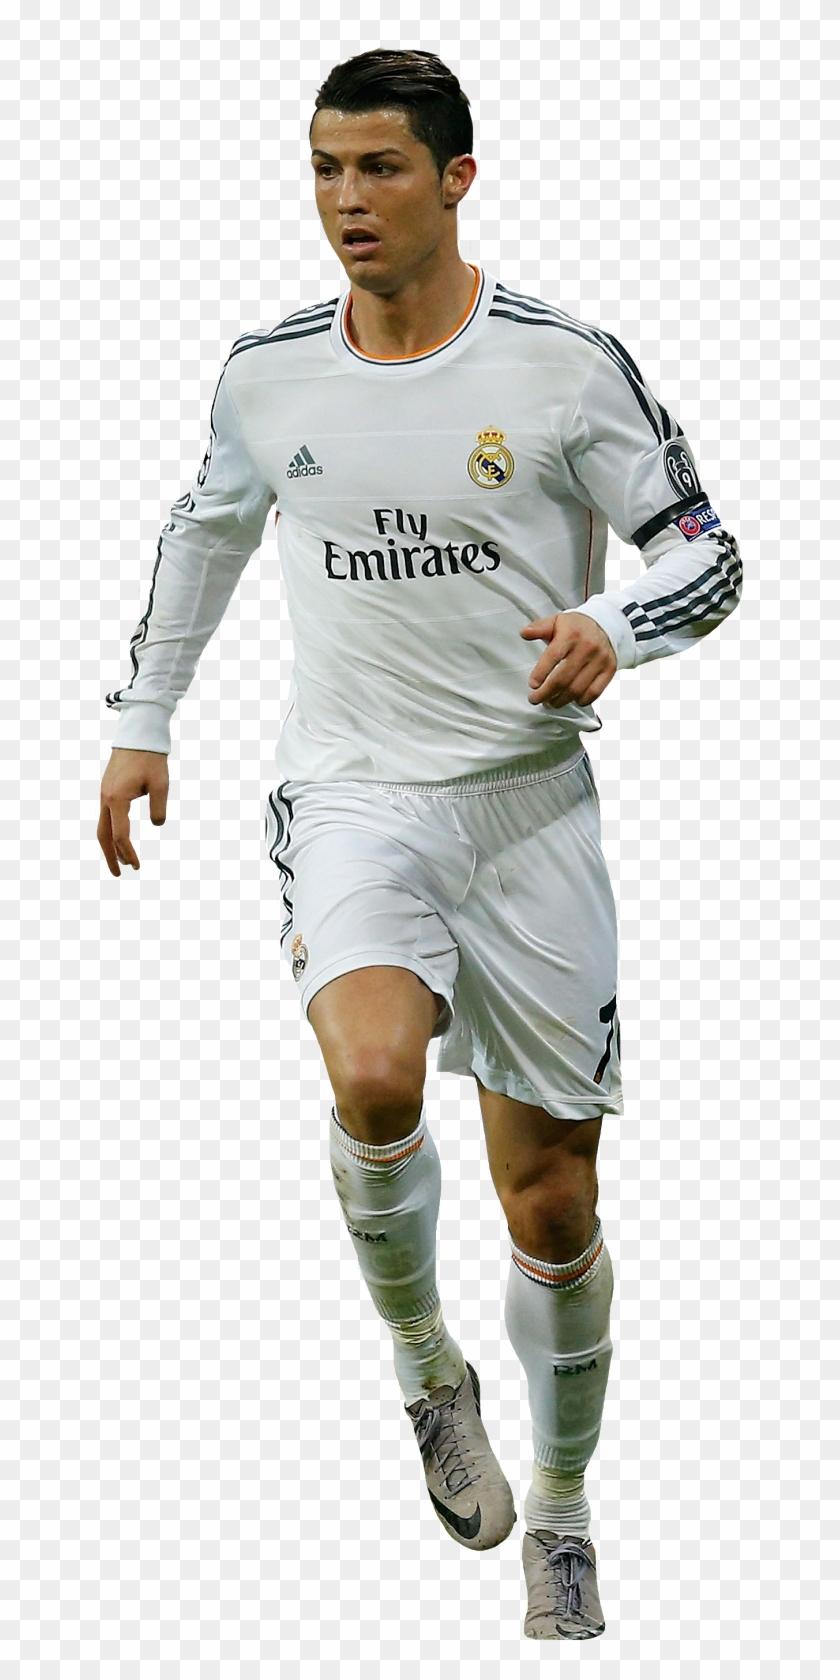 Football player on laptop clipart vector Cristiano Ronaldo Football Player Shoe Sport Clipart - Football ... vector